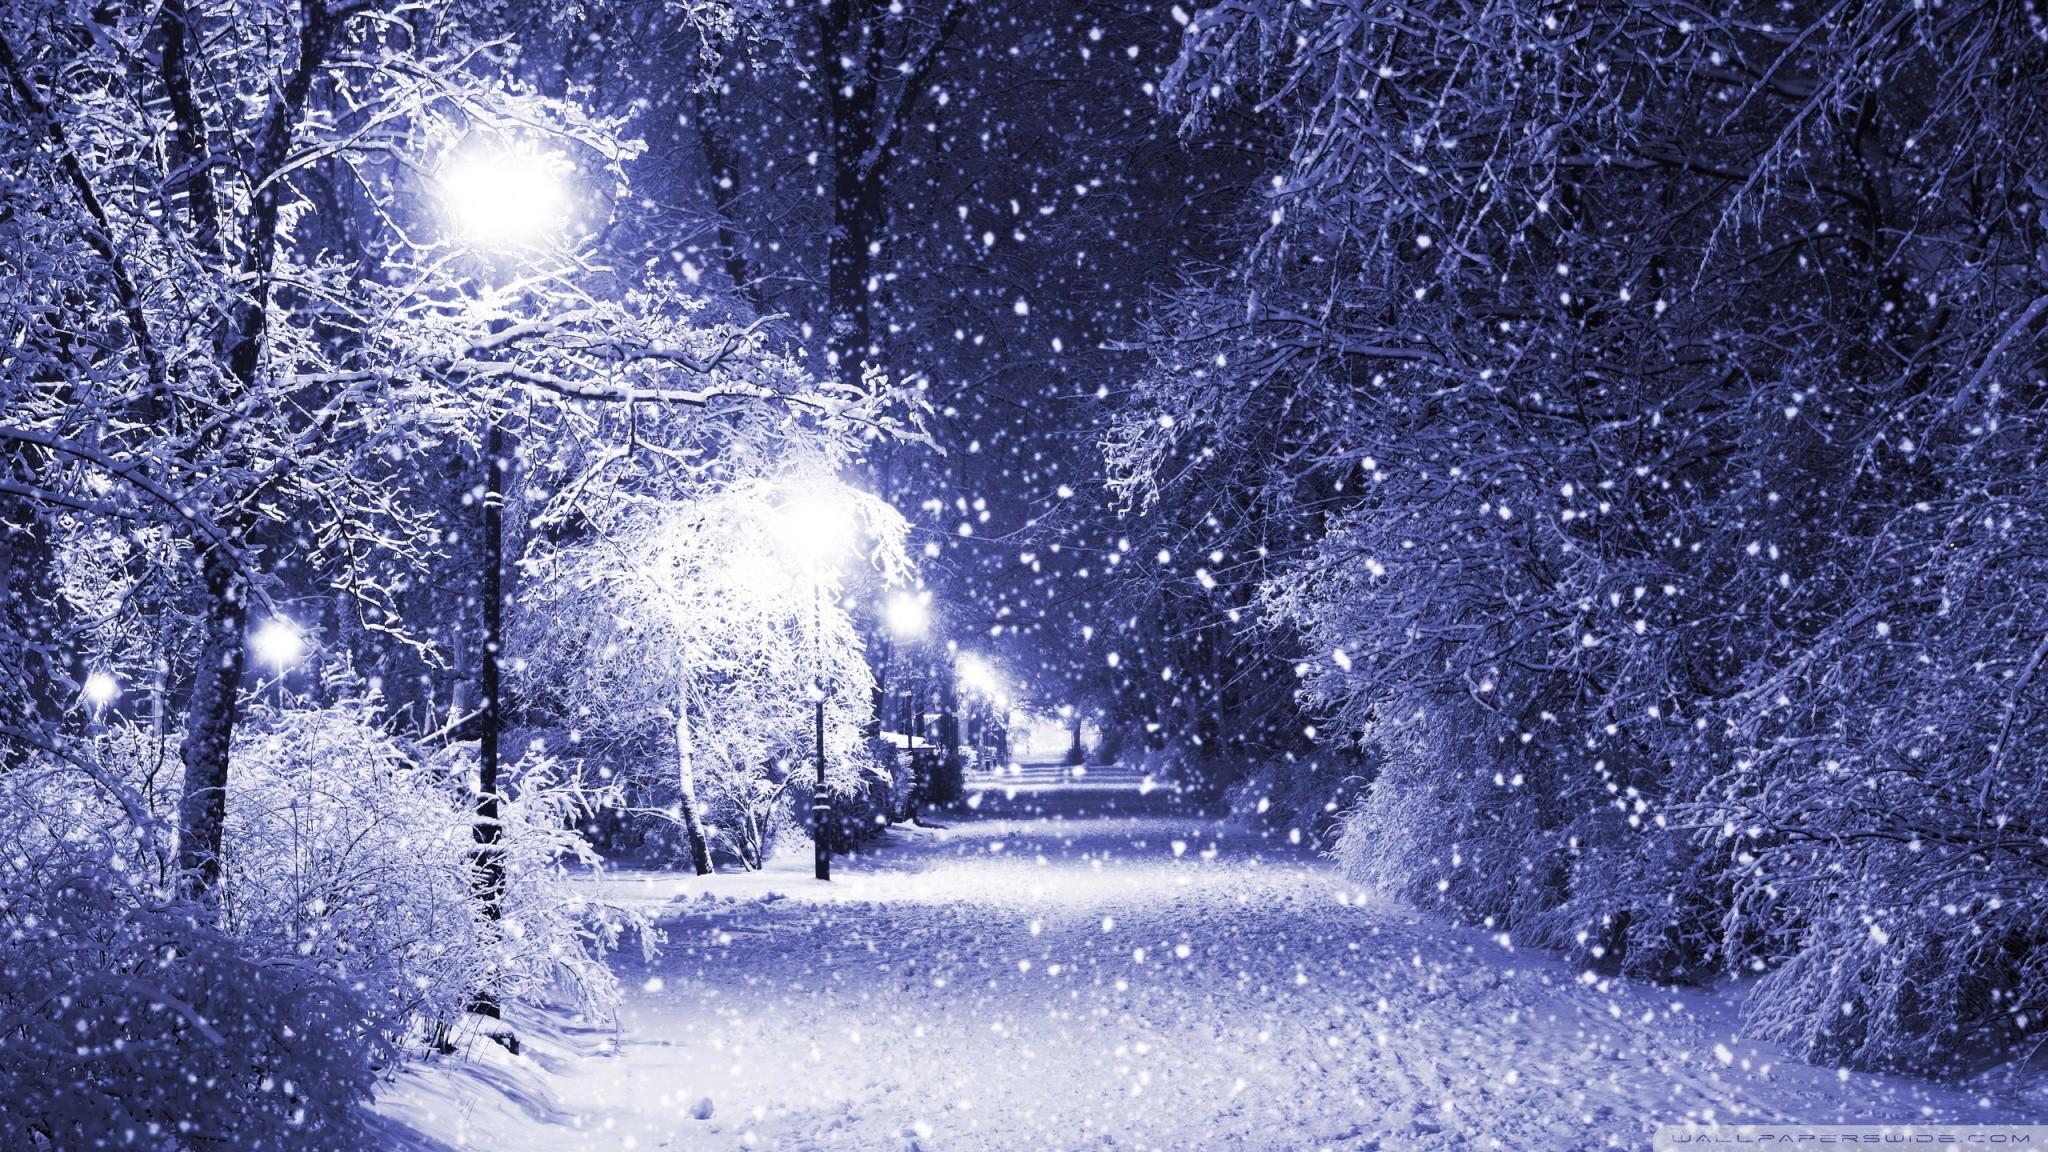 Explore Winter Wallpaper Hd, Scenery Wallpaper, and more!